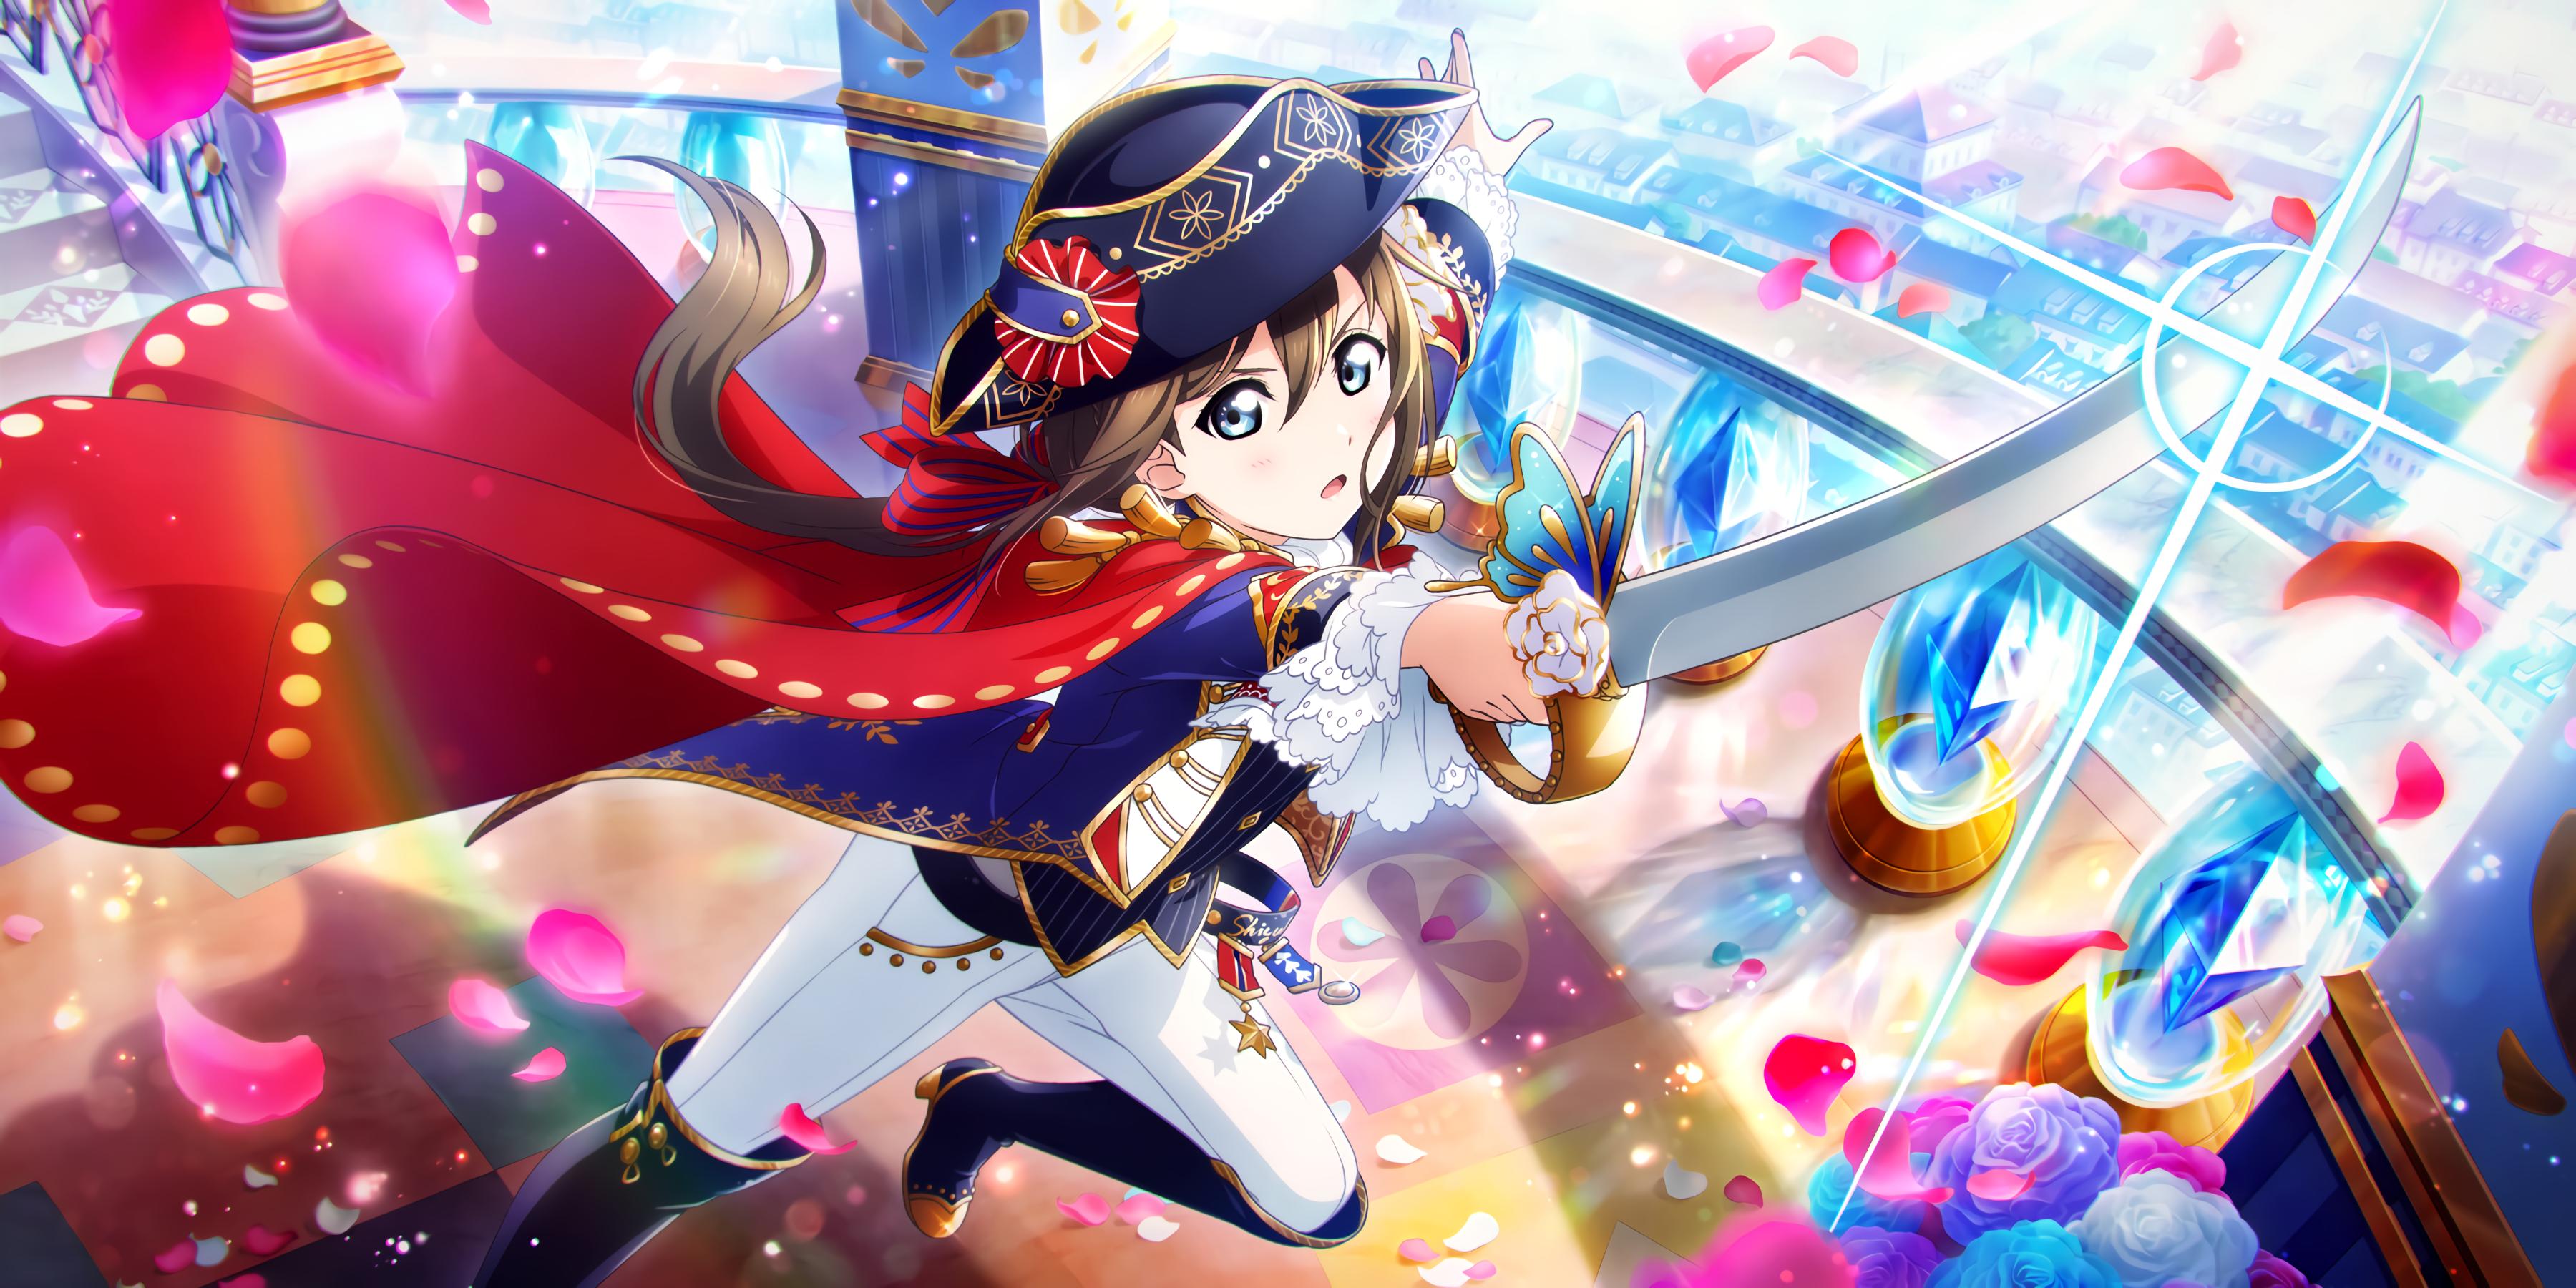 Ur Osaka Shizuku Stop It You Know How Ticklish I Am Rose Knight Cards List All Stars Idol Story Love Live